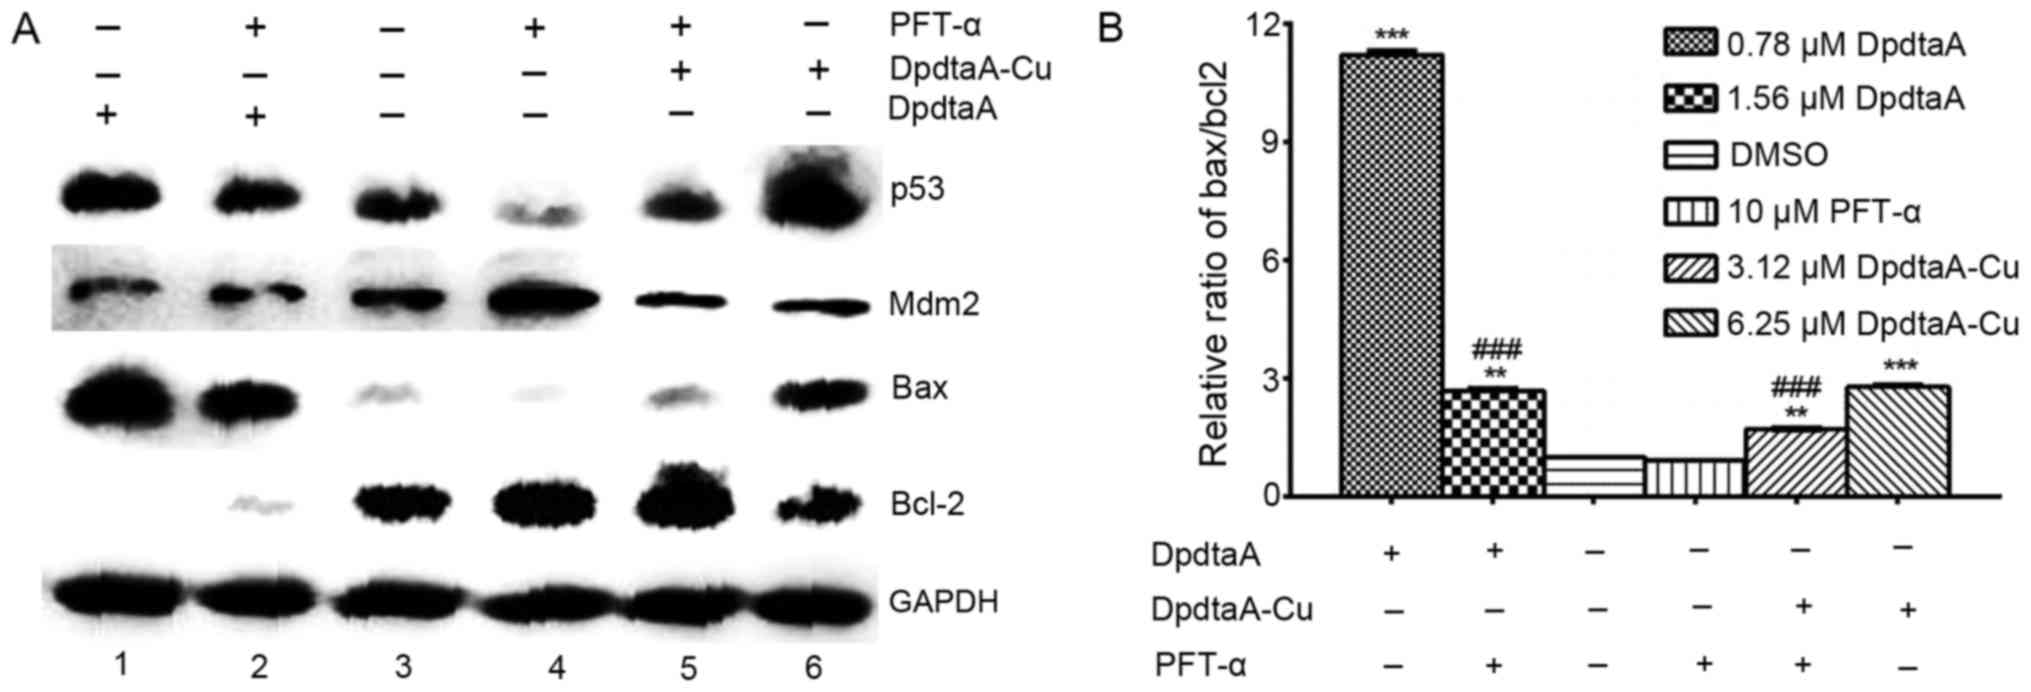 Antiproliferative activity of di-2-pyridylhydrazone